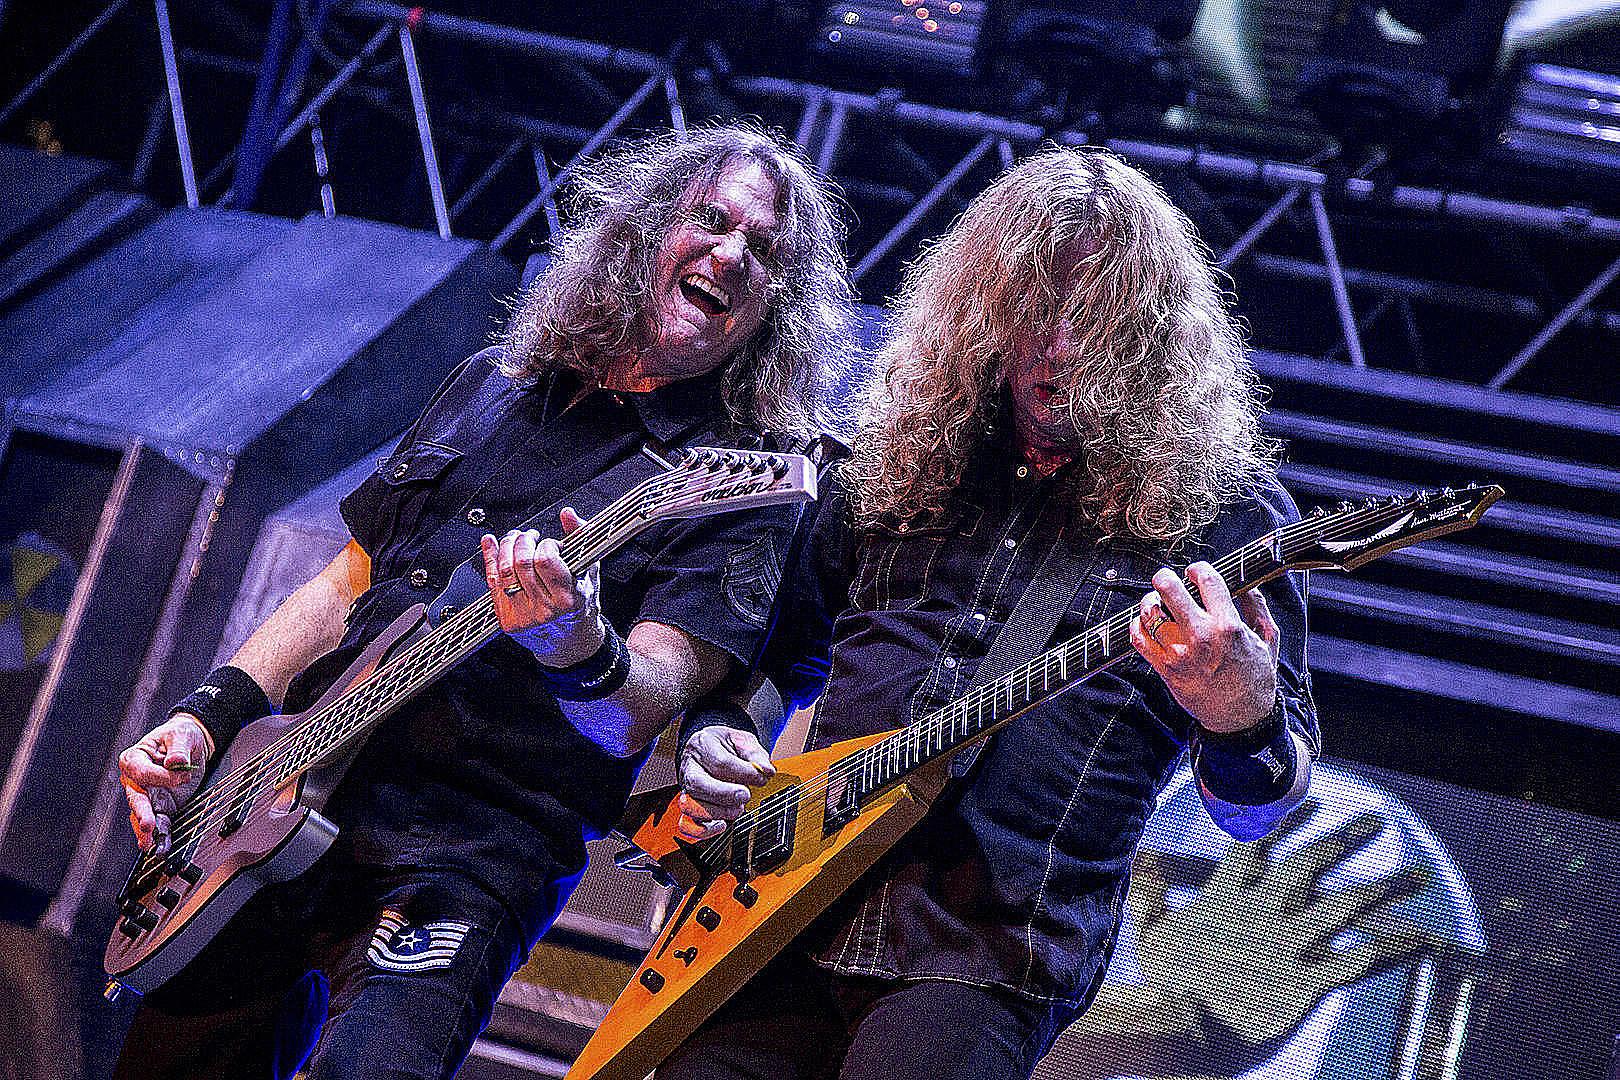 Megadeth's David Ellefson - New Record Amazing Prog-Metal Album